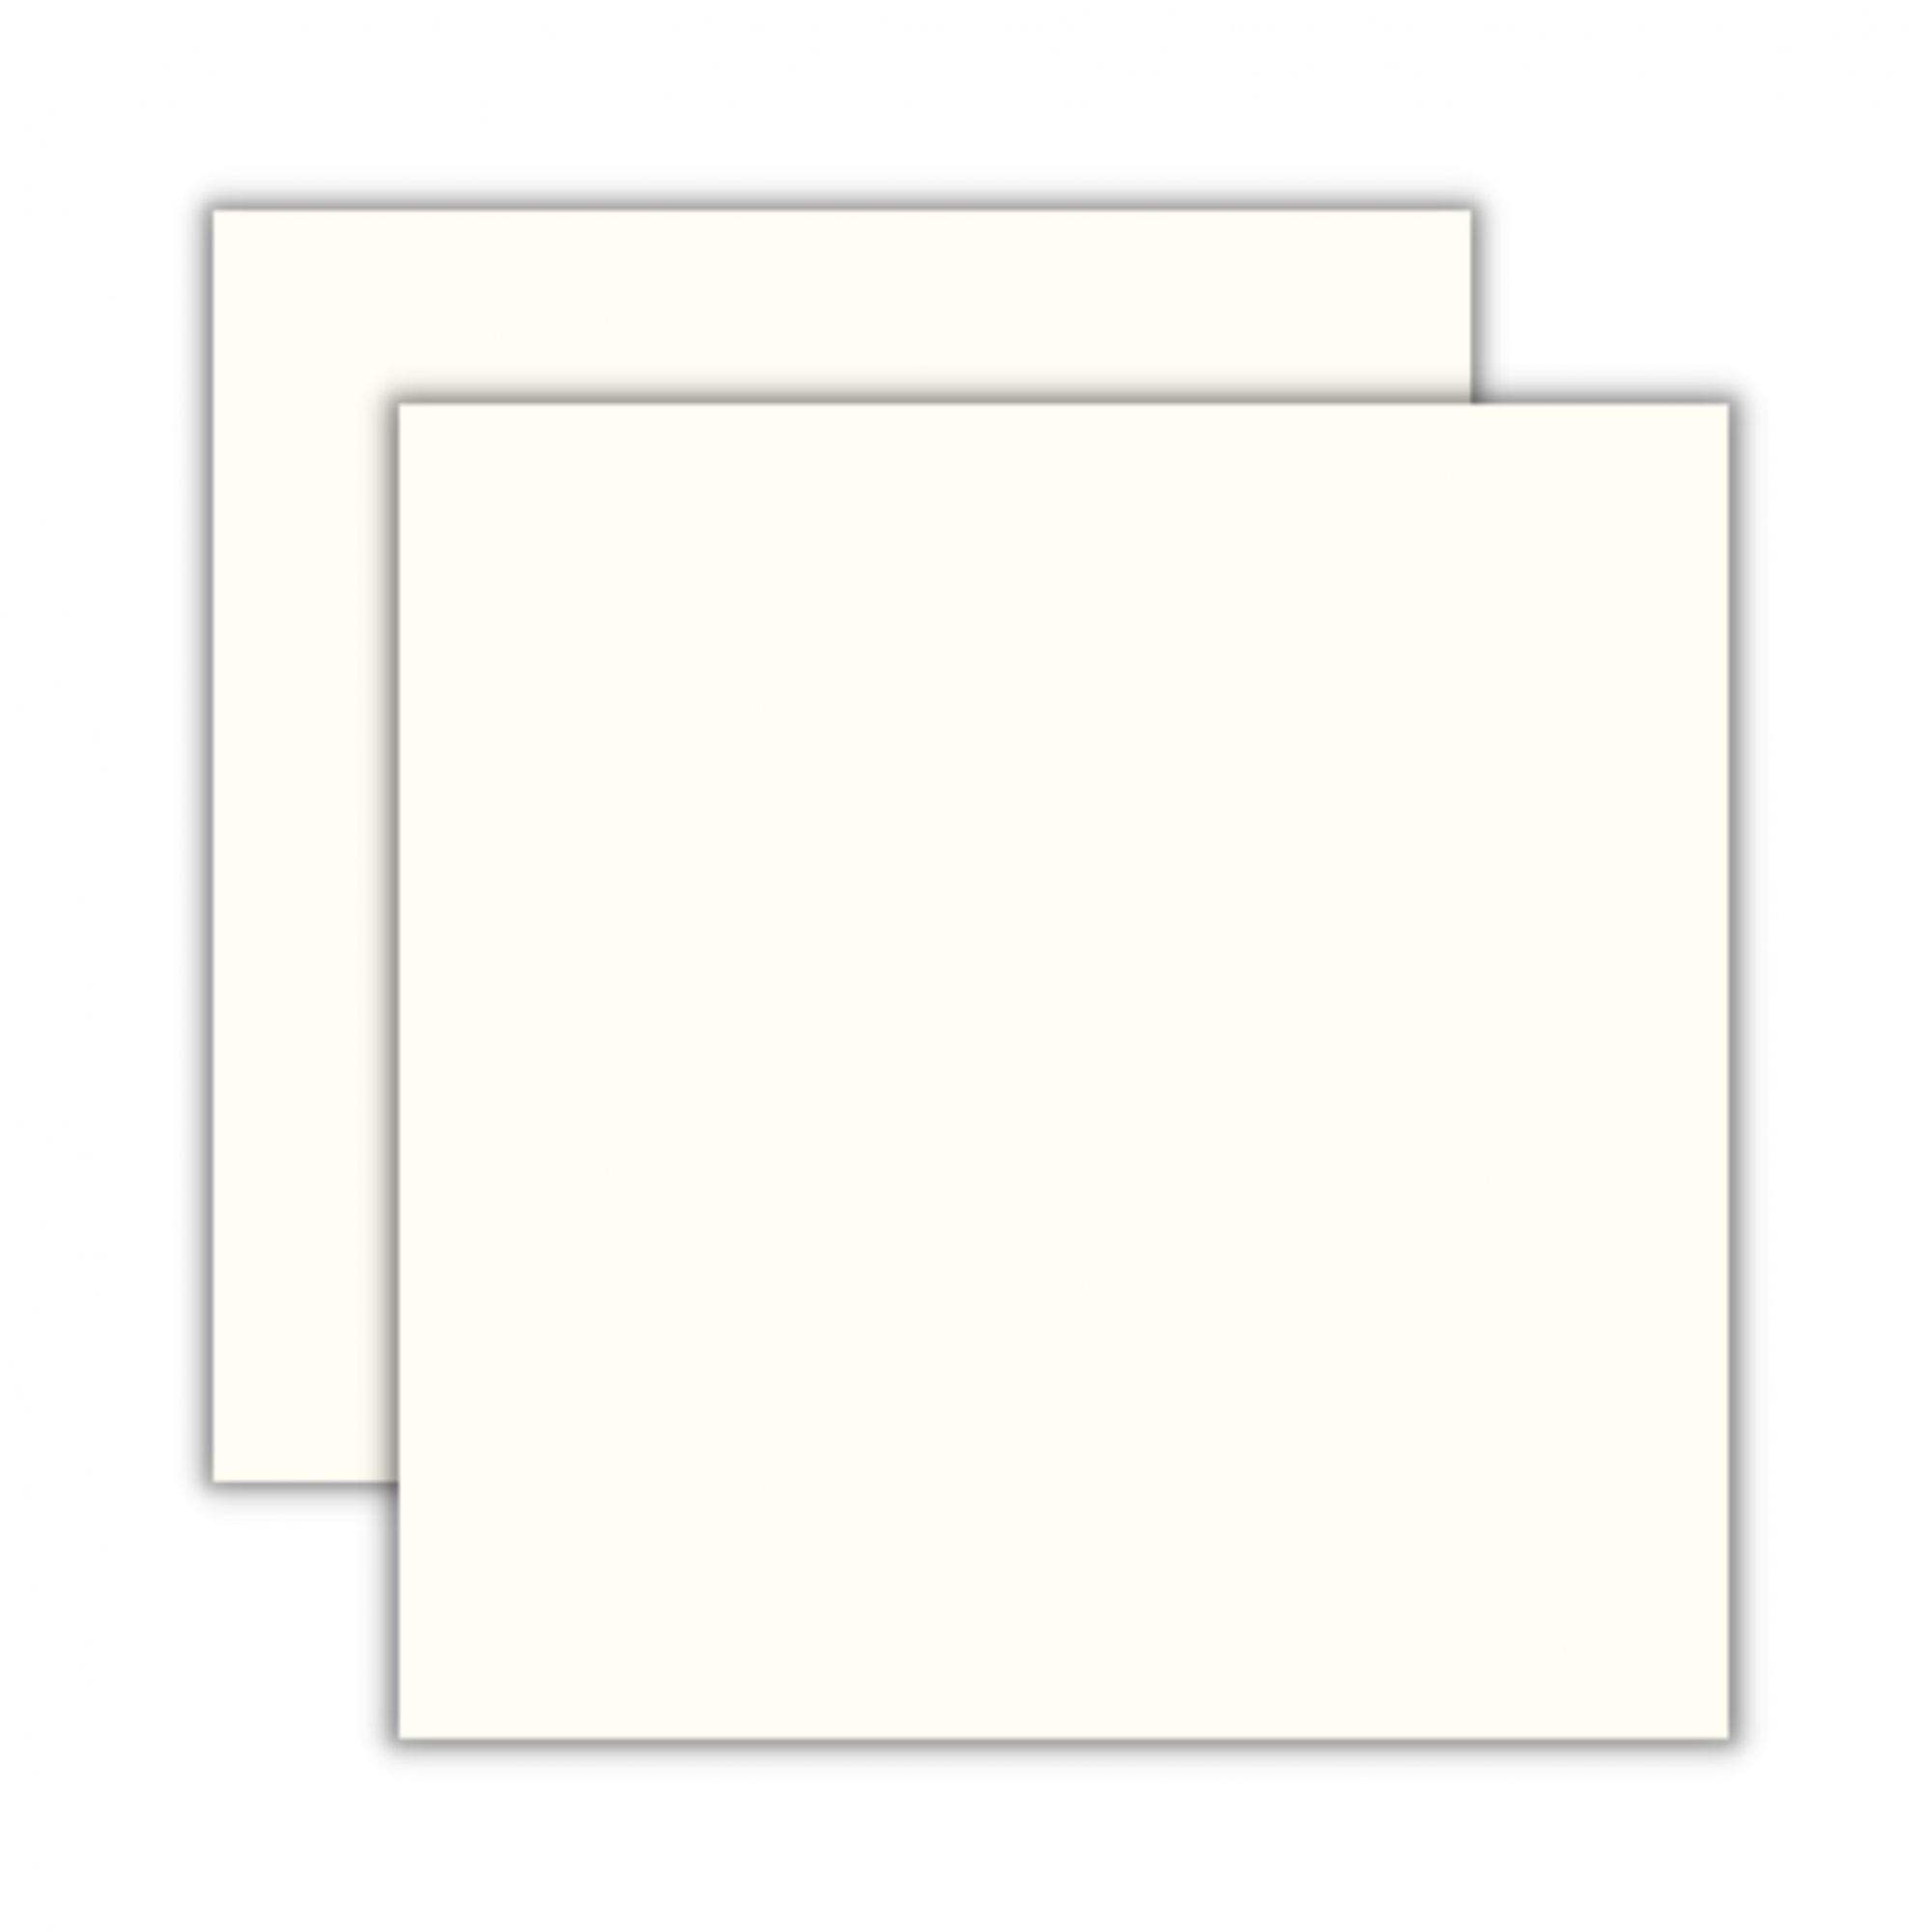 Cristallo Bianco 60x60cm<br /><b>R$ 55,80 M²</b><br />Cx 2,15 M²<b> R$ 119,97</b>